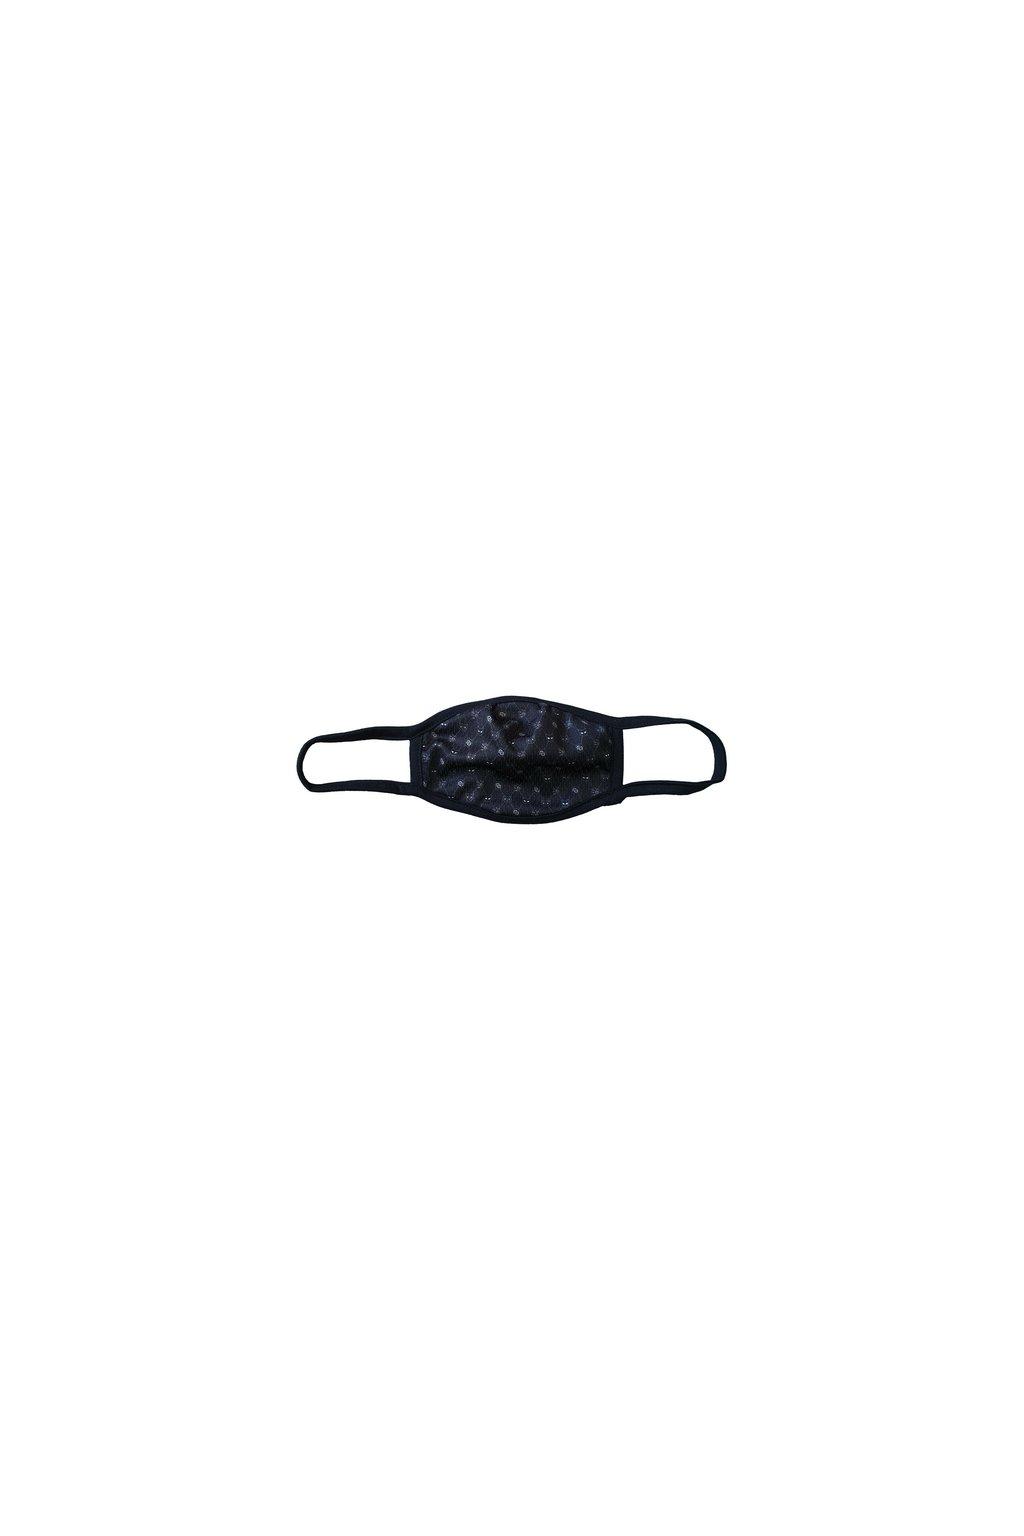 Rouška Galaxy Black MH2 9G9 1